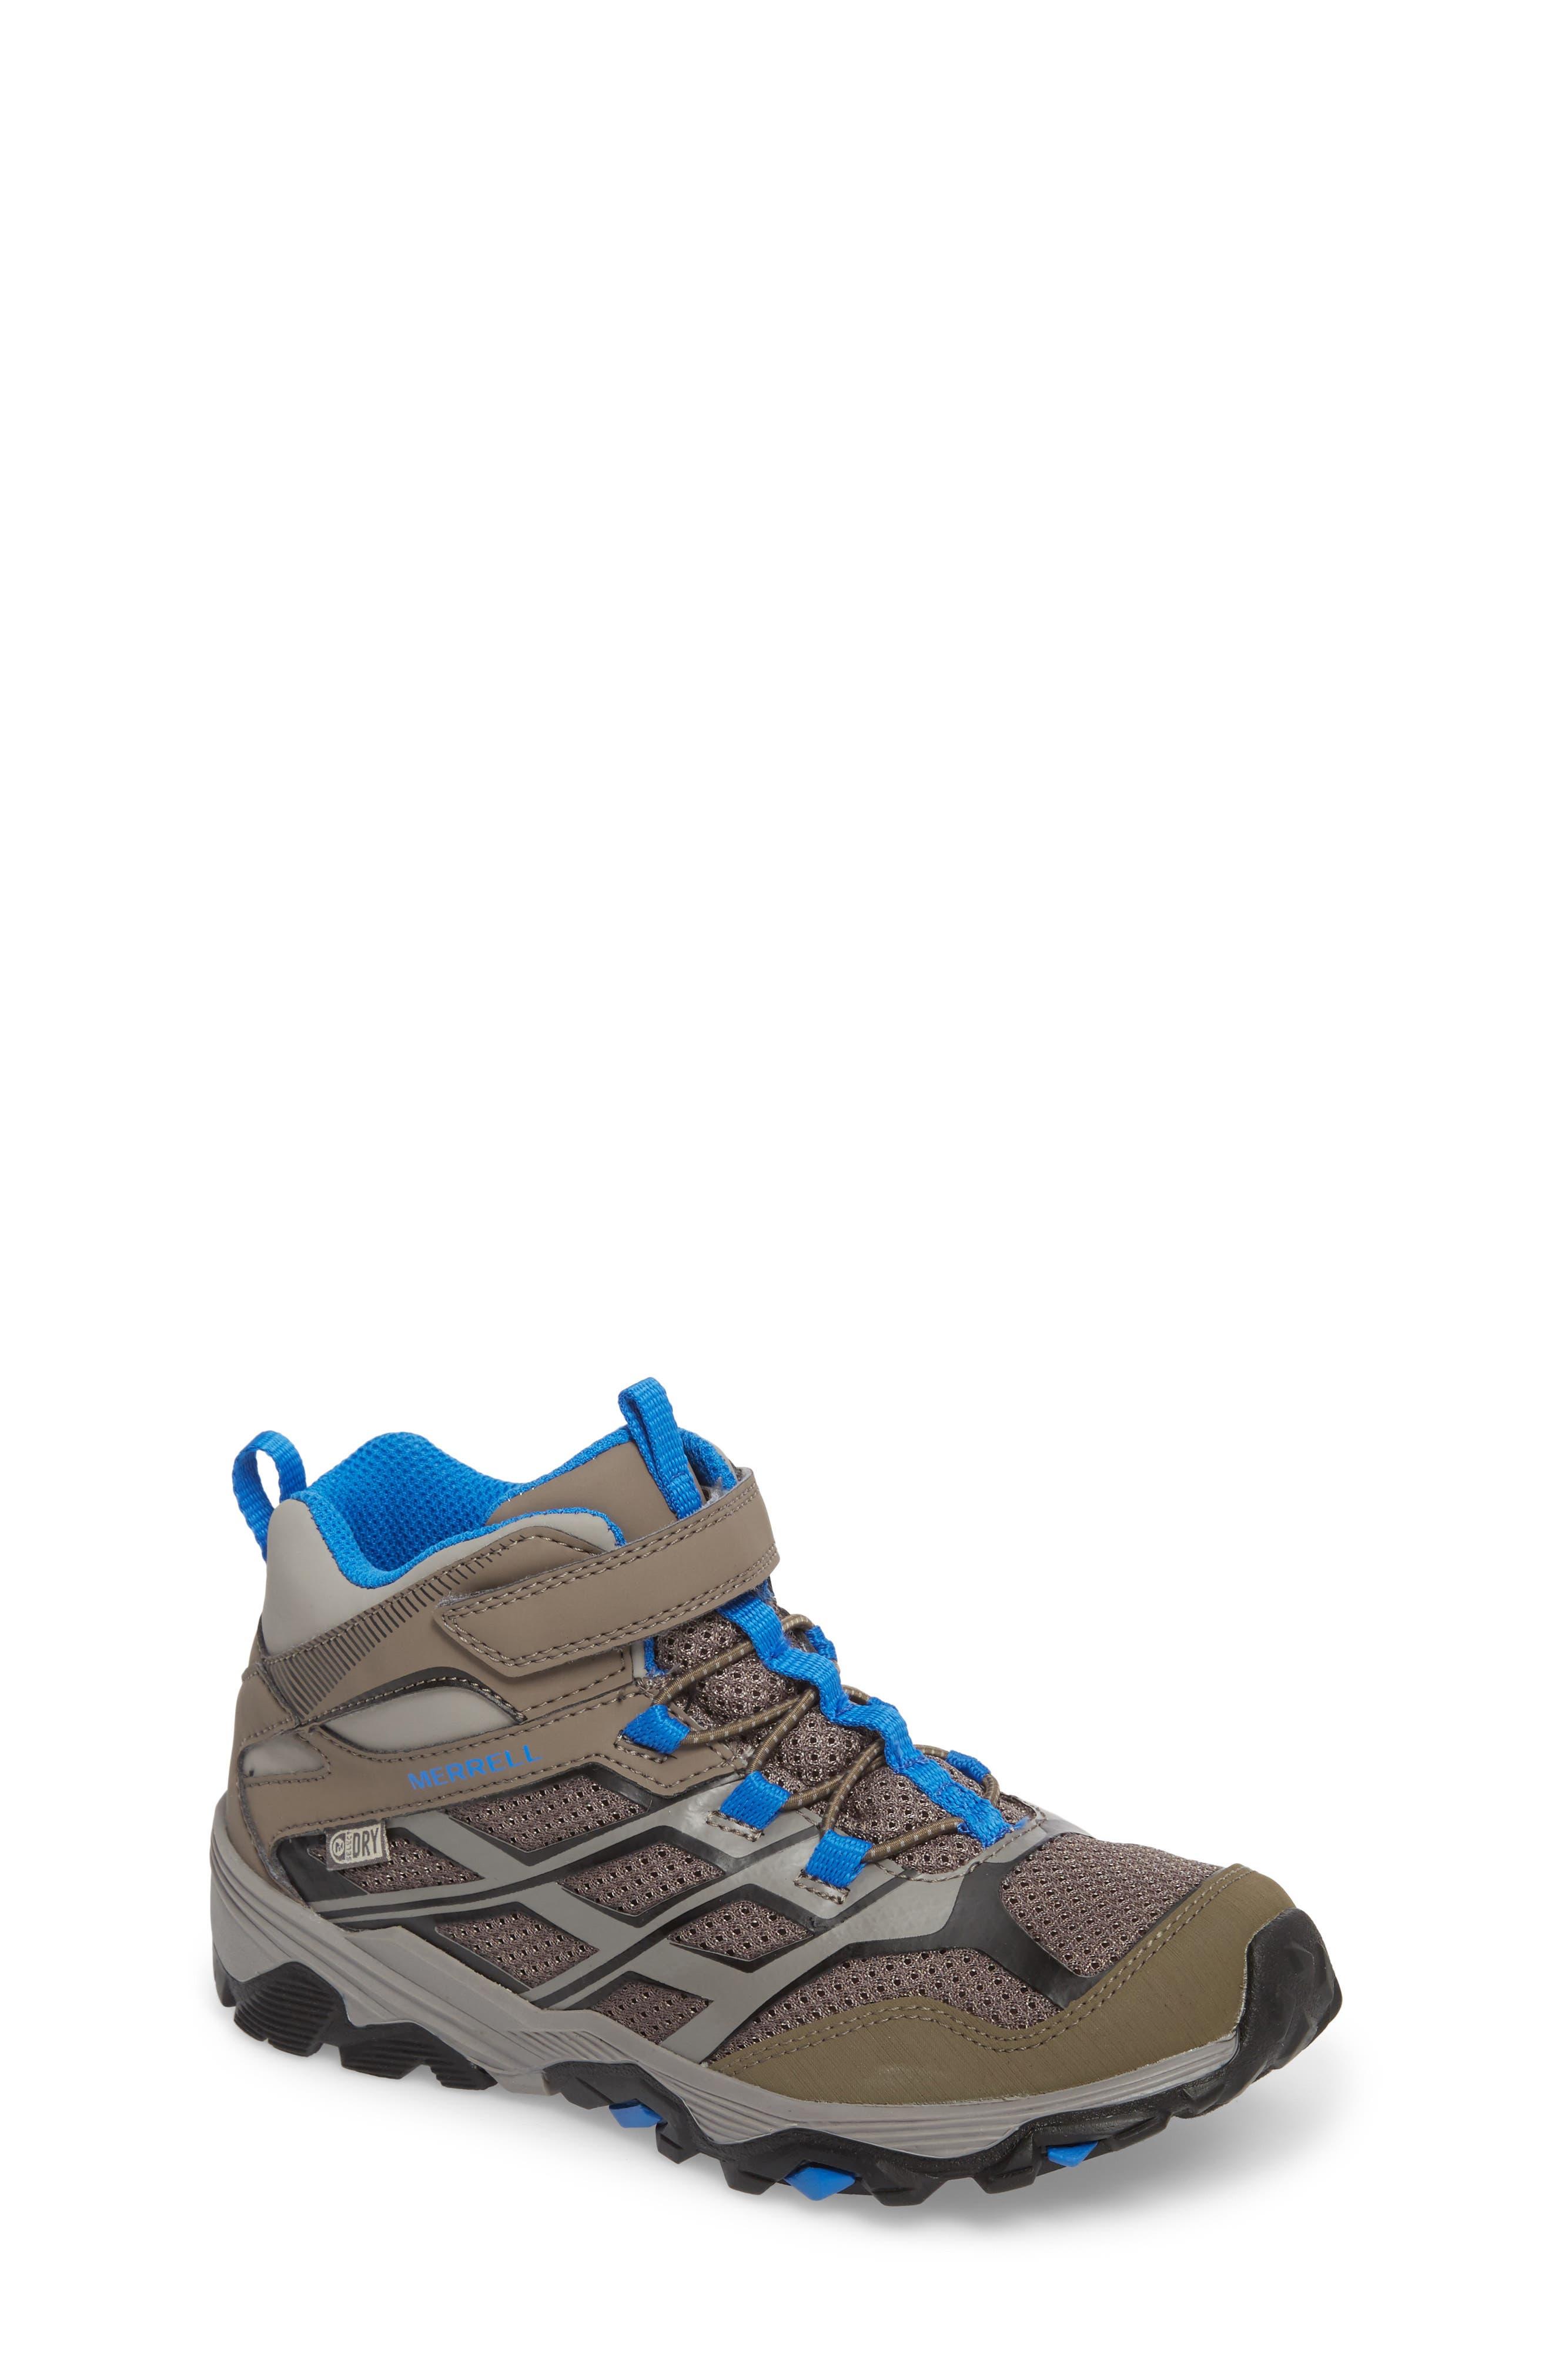 Alternate Image 1 Selected - Merrell Moab FST Mid Top Waterproof Sneaker Boot (Toddler, Little Kid & Big Kid)